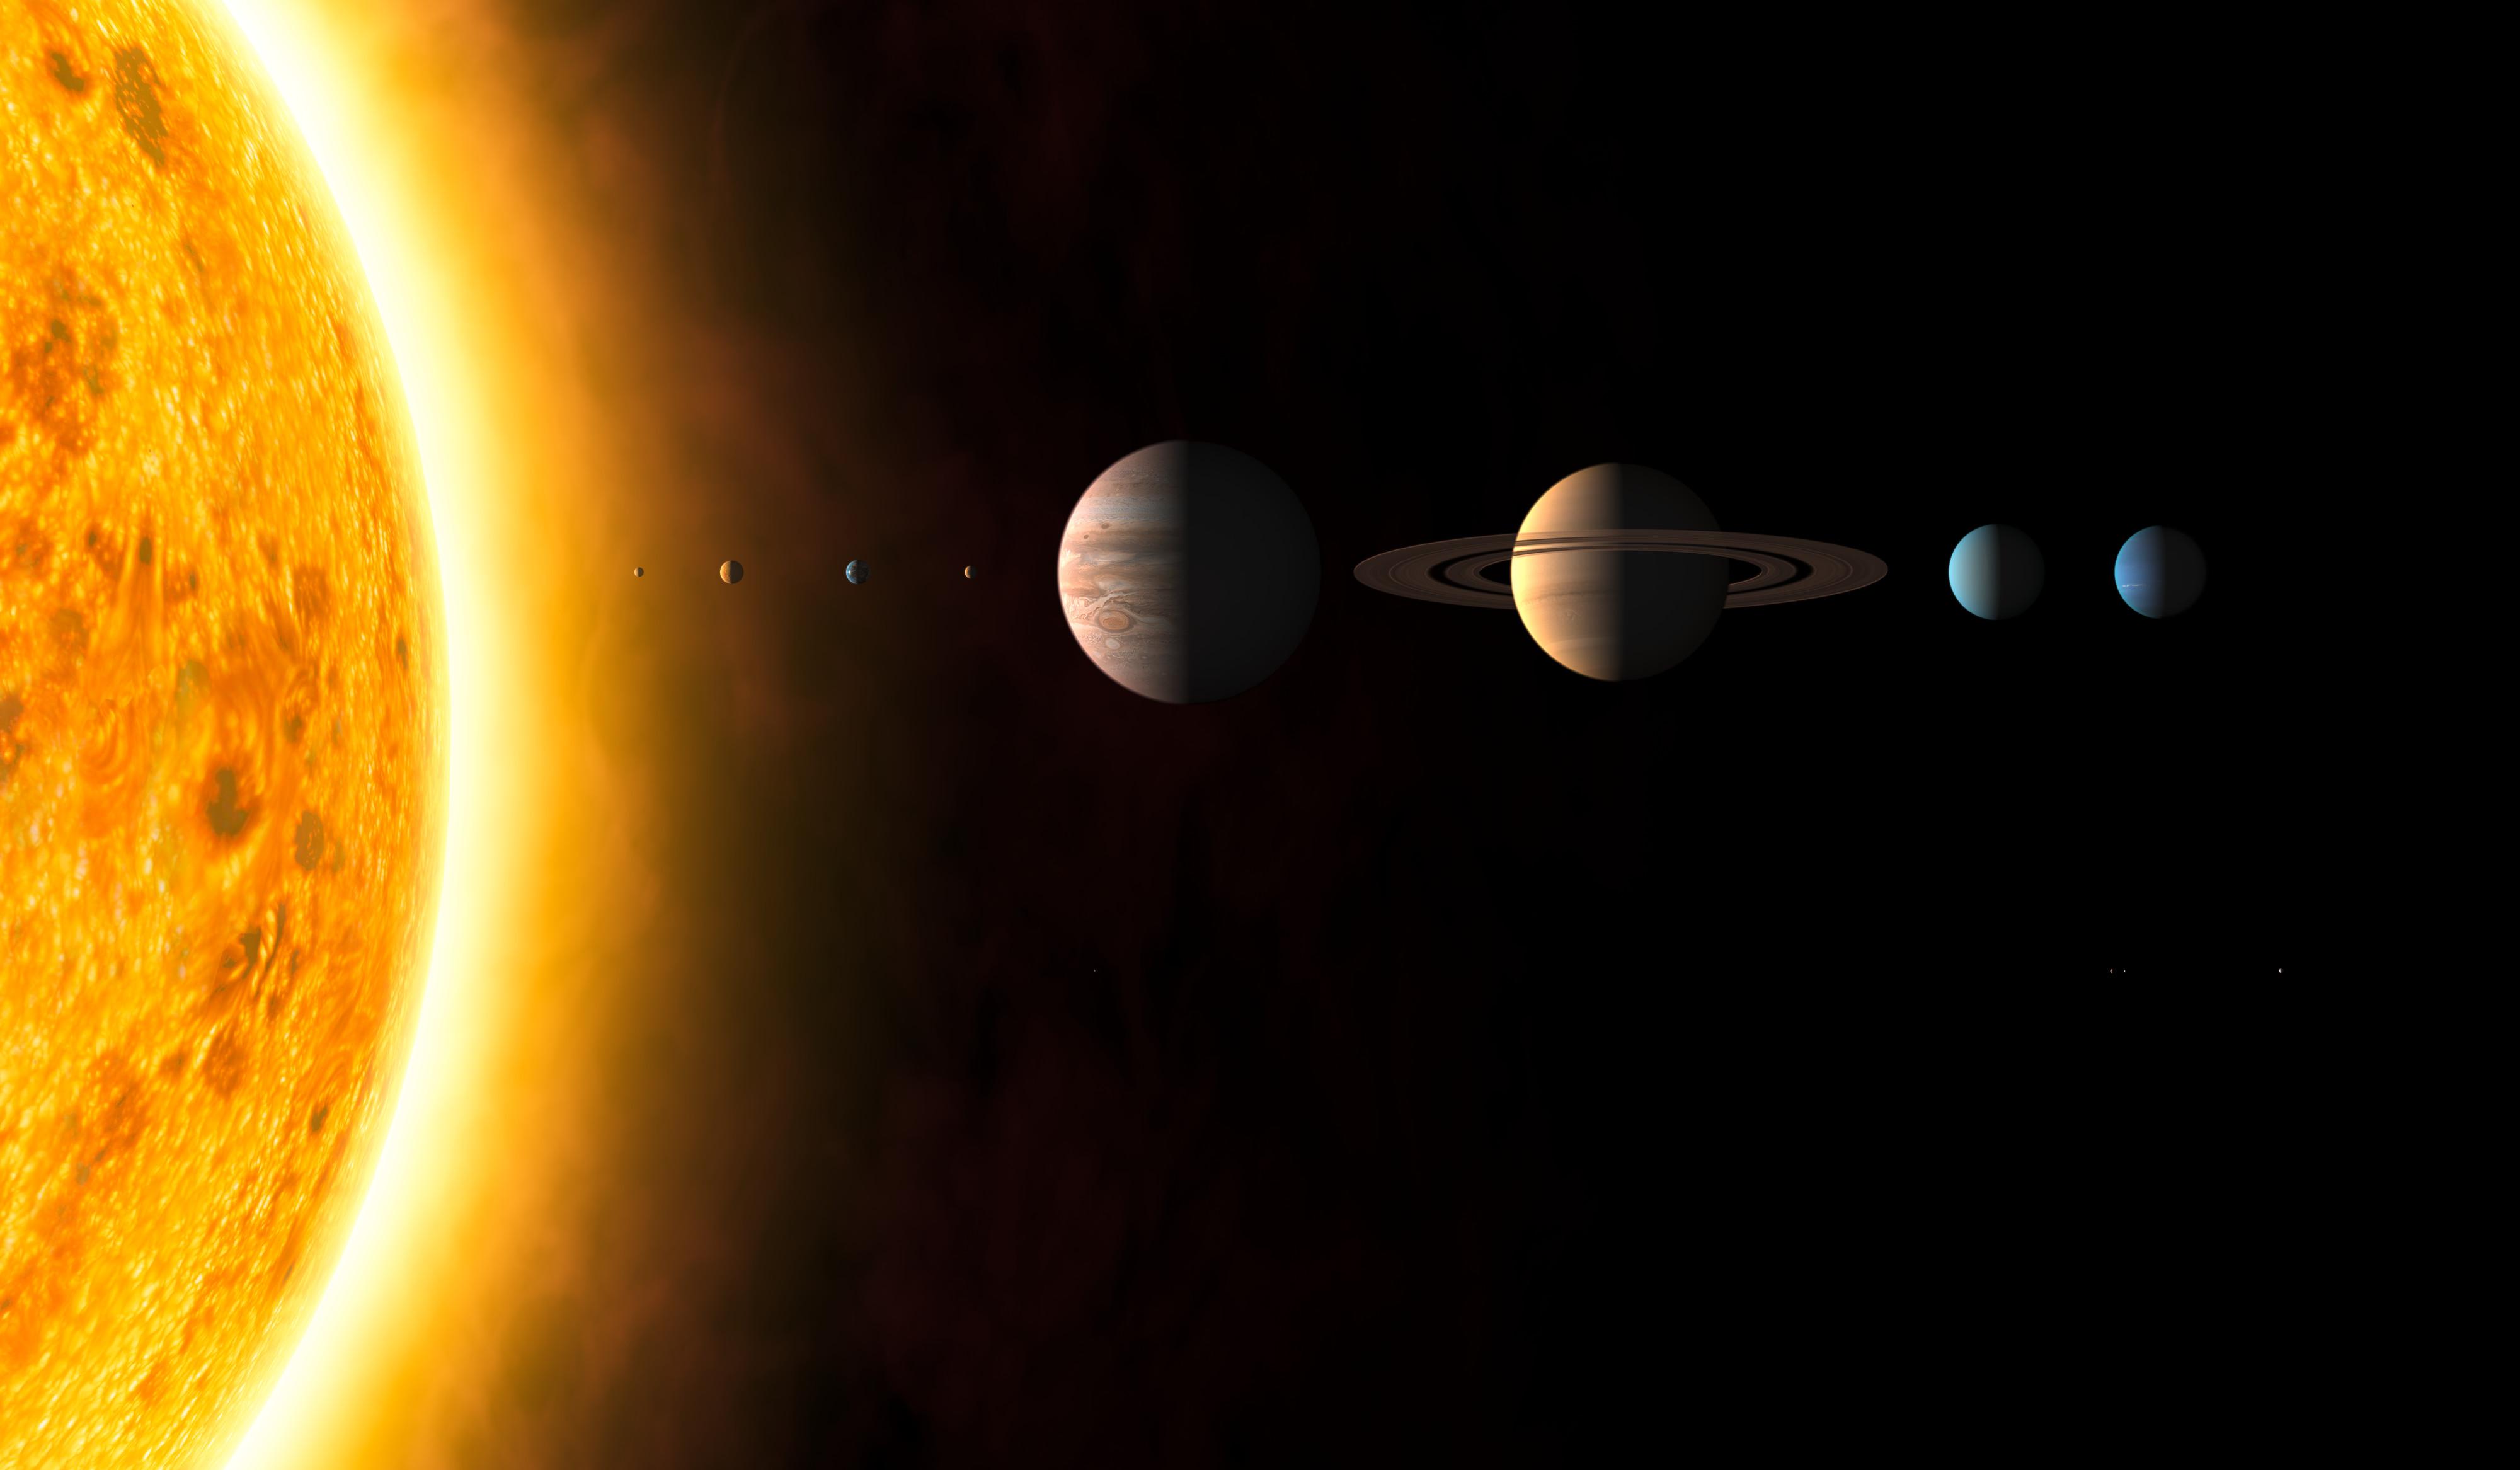 hubble telescope solar system - photo #6